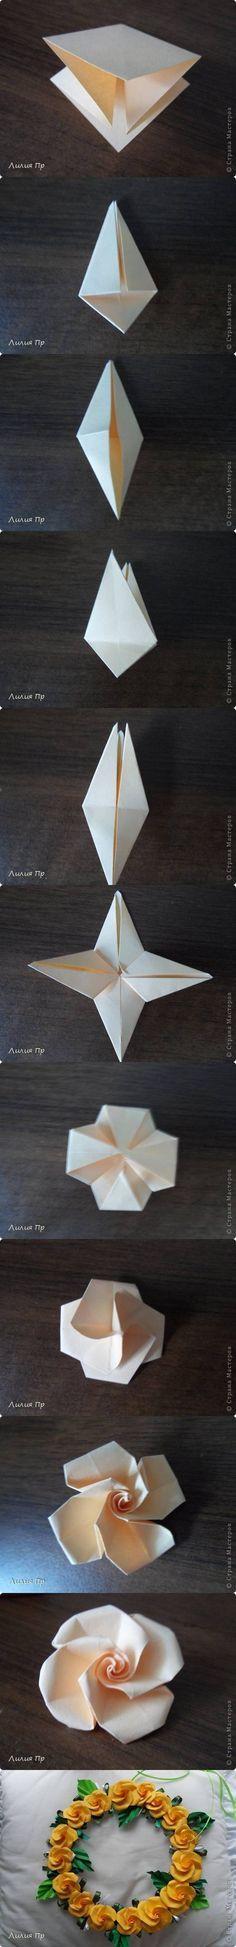 Paper art diy origami rose 41 ideas for 2019 Origami Rose, Diy Origami Box, Origami Simple, Origami And Kirigami, Origami Paper Art, Origami Bookmark, Useful Origami, Diy Paper, Paper Crafts